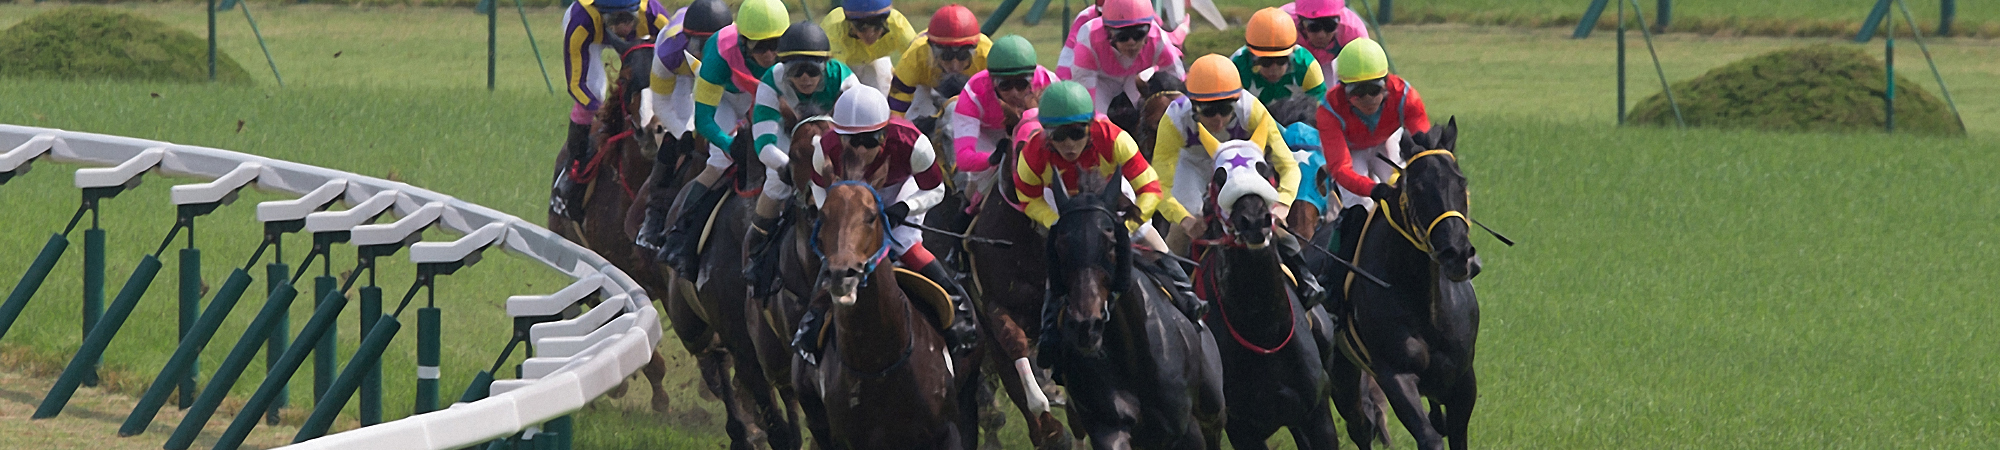 racehorse_1